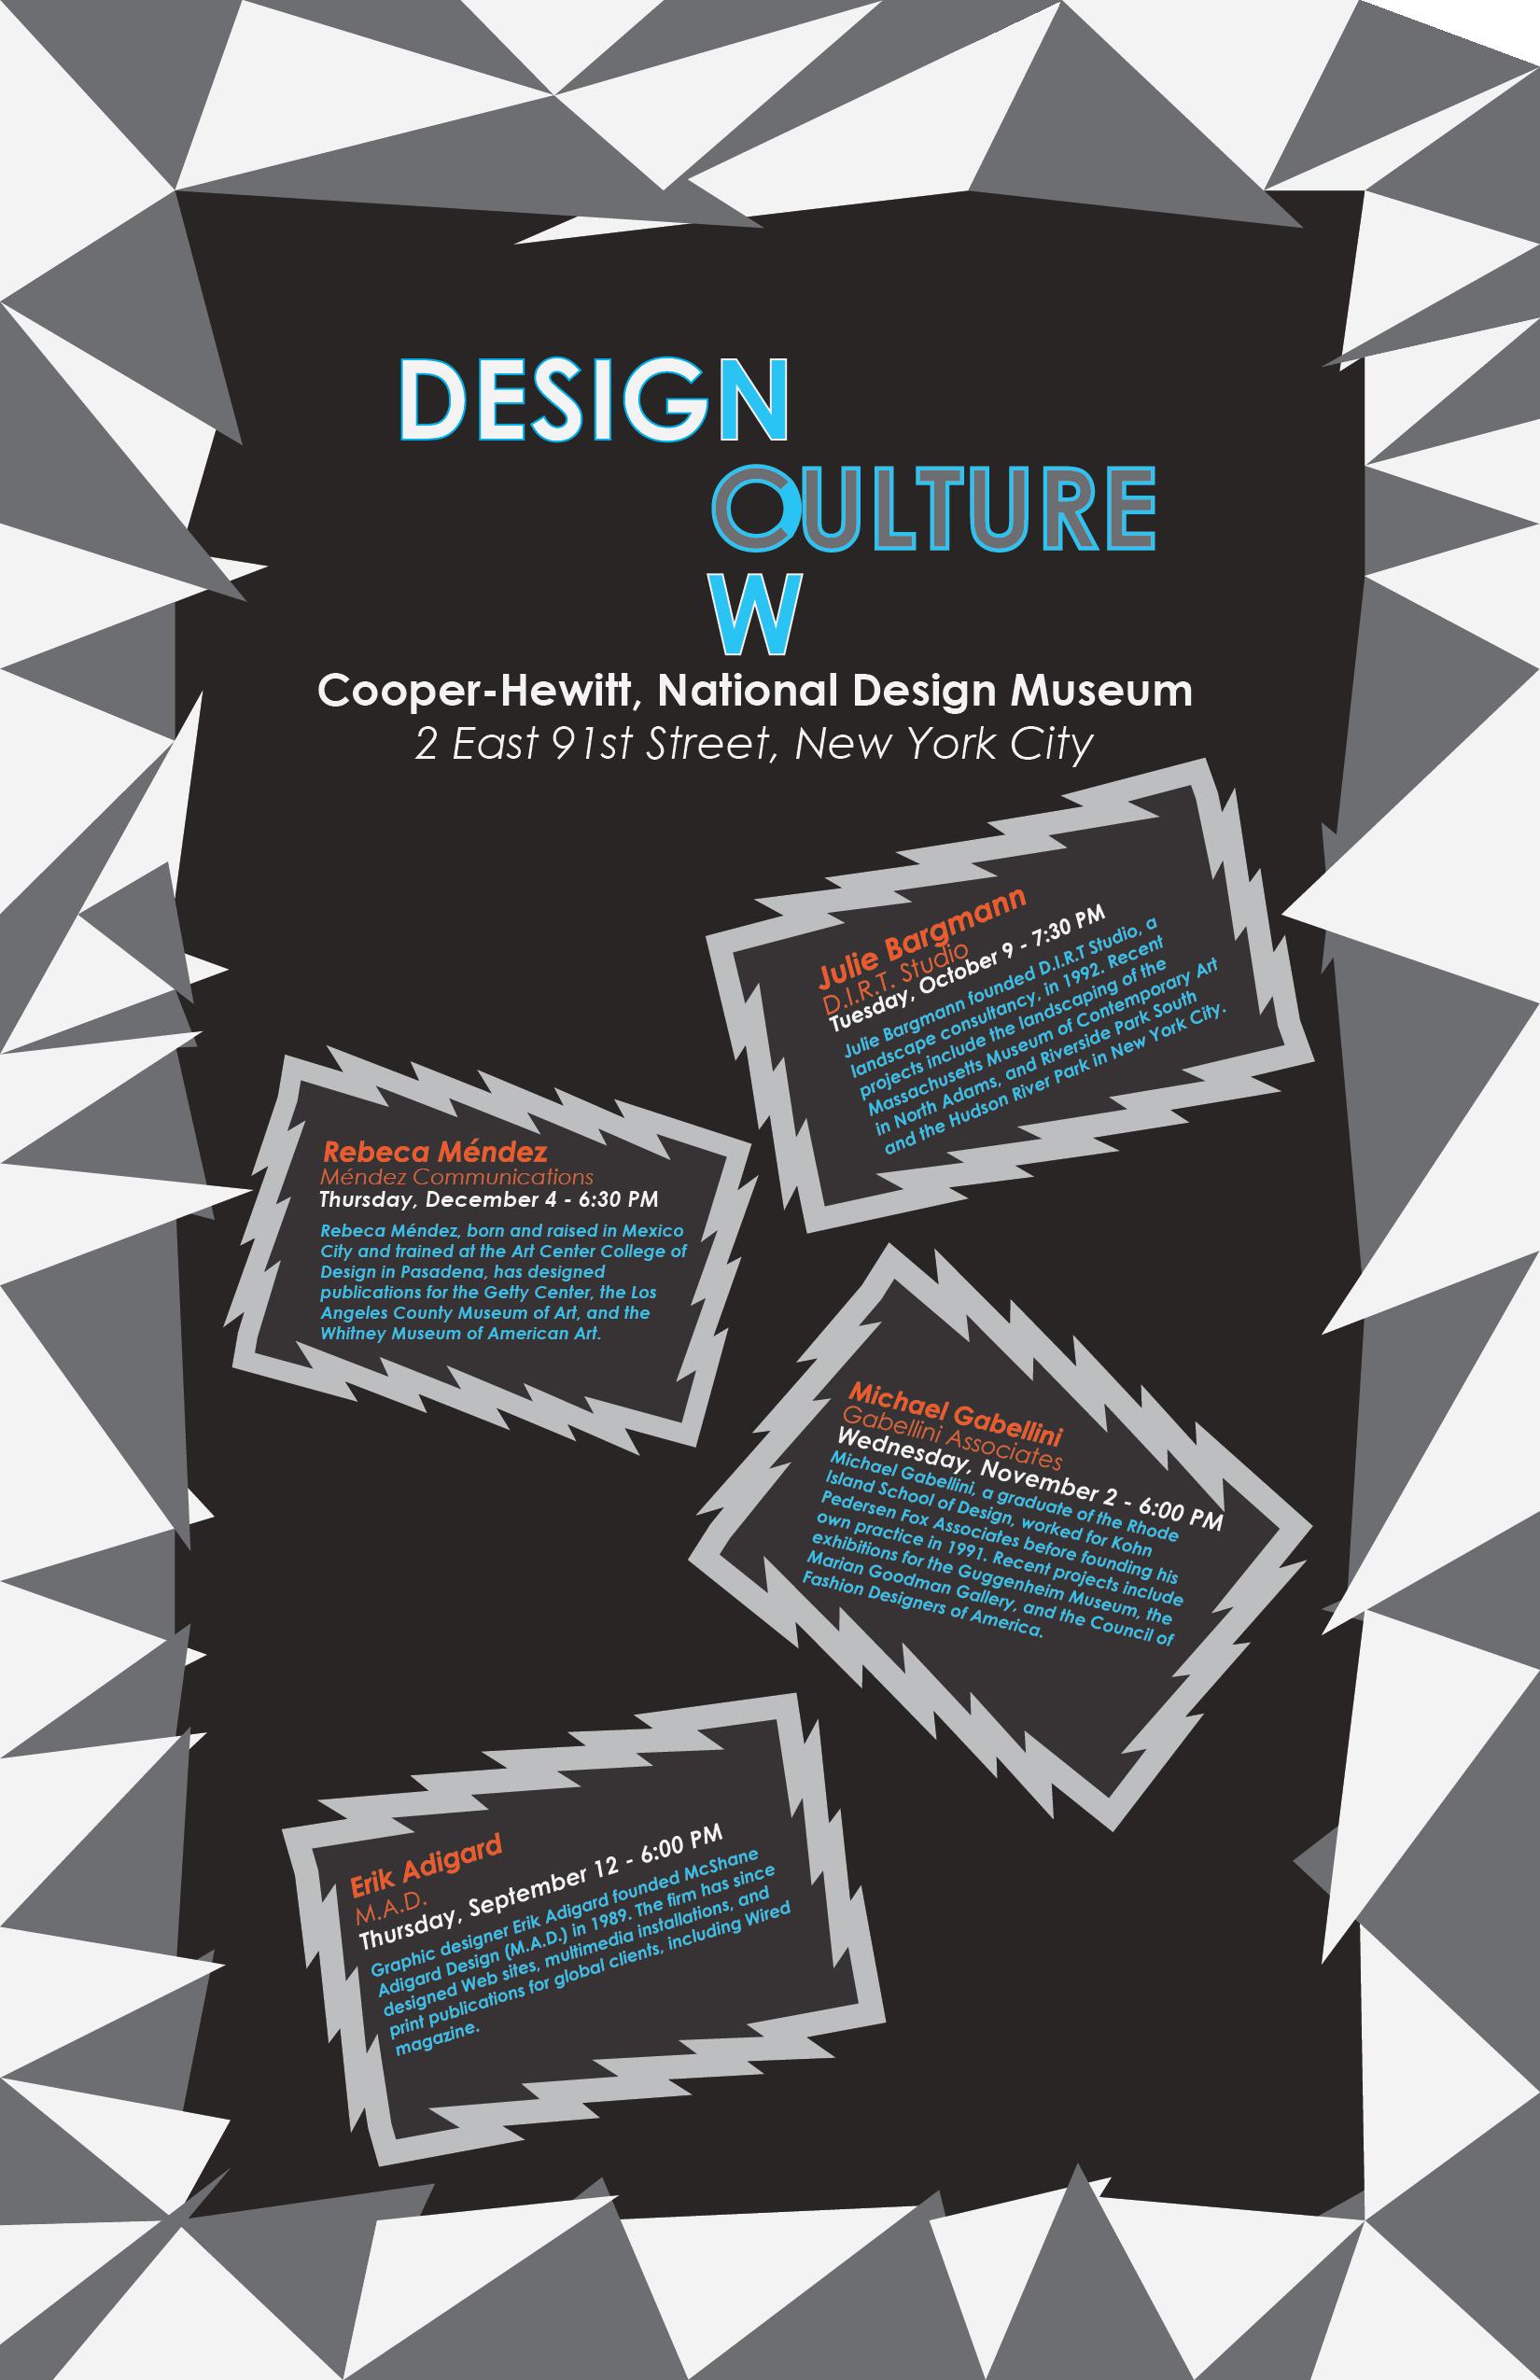 Cole Hardin Design Page - Design Culture Now Poster